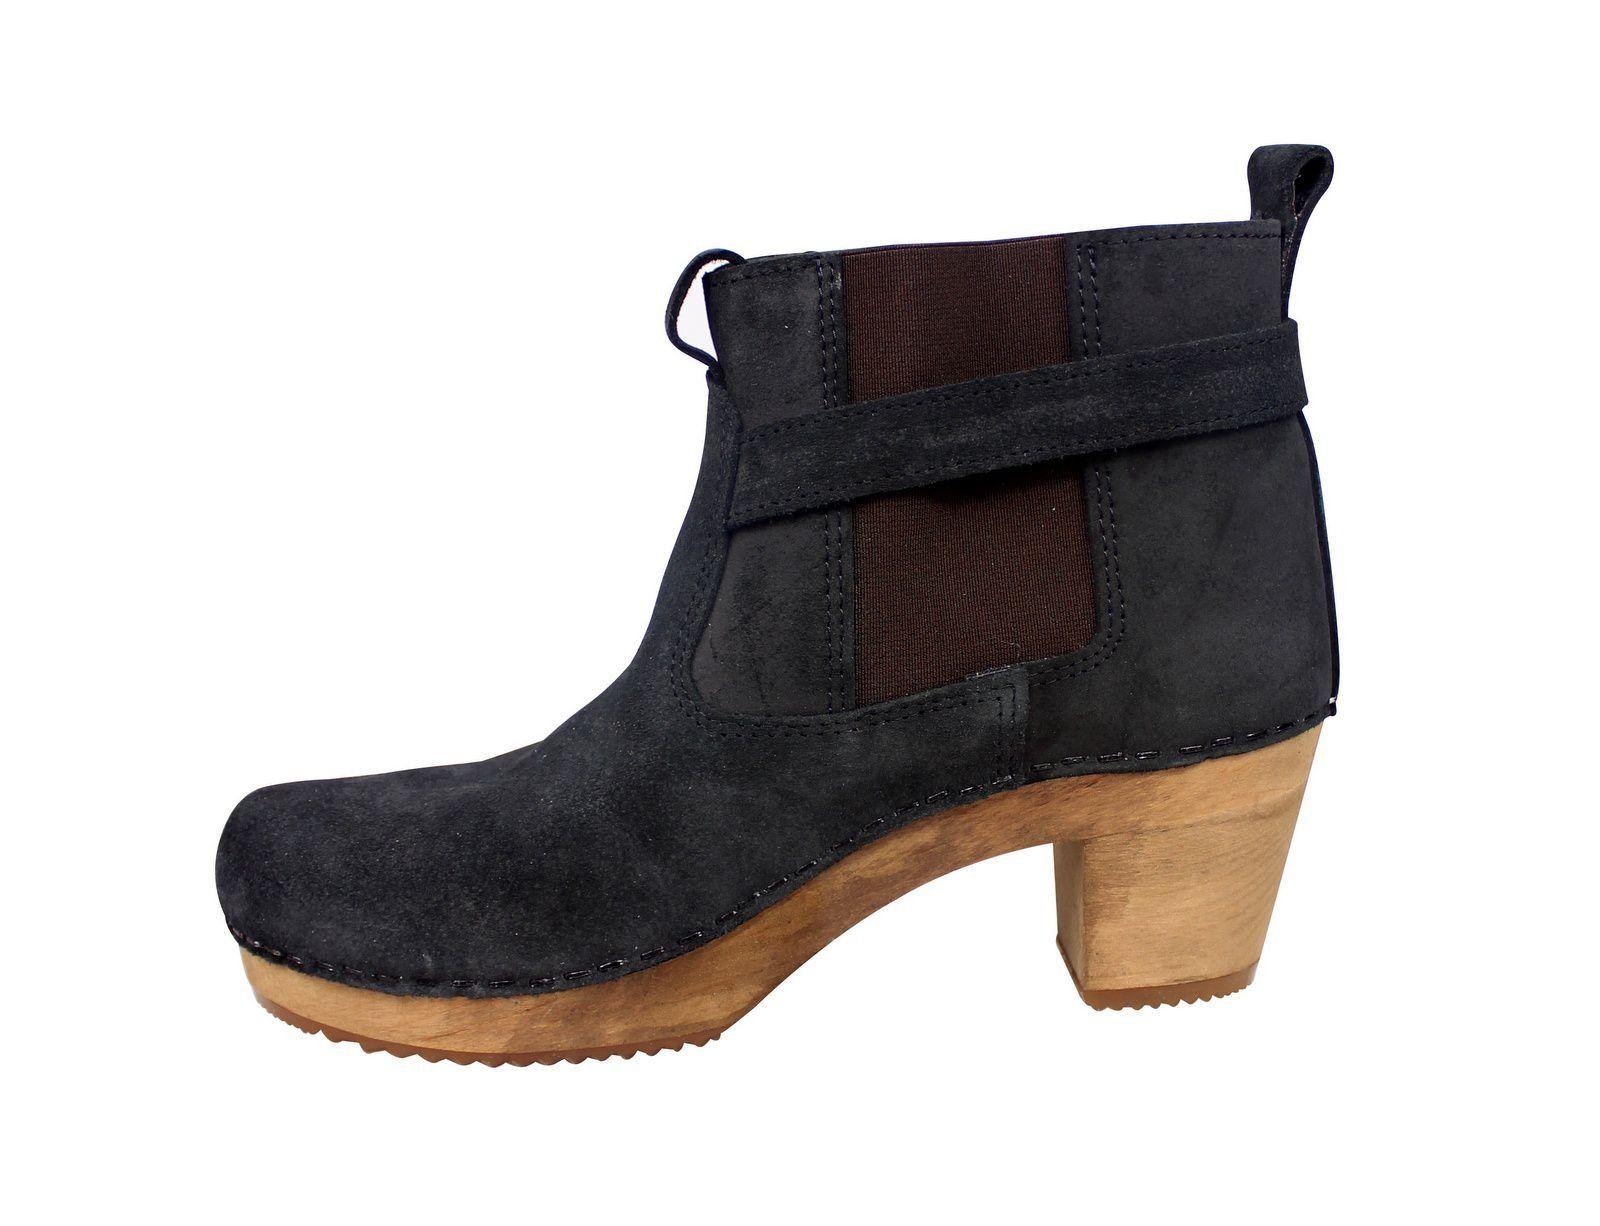 Sanita Peggy Sue Jodphur style ankle boots Black Rev Side